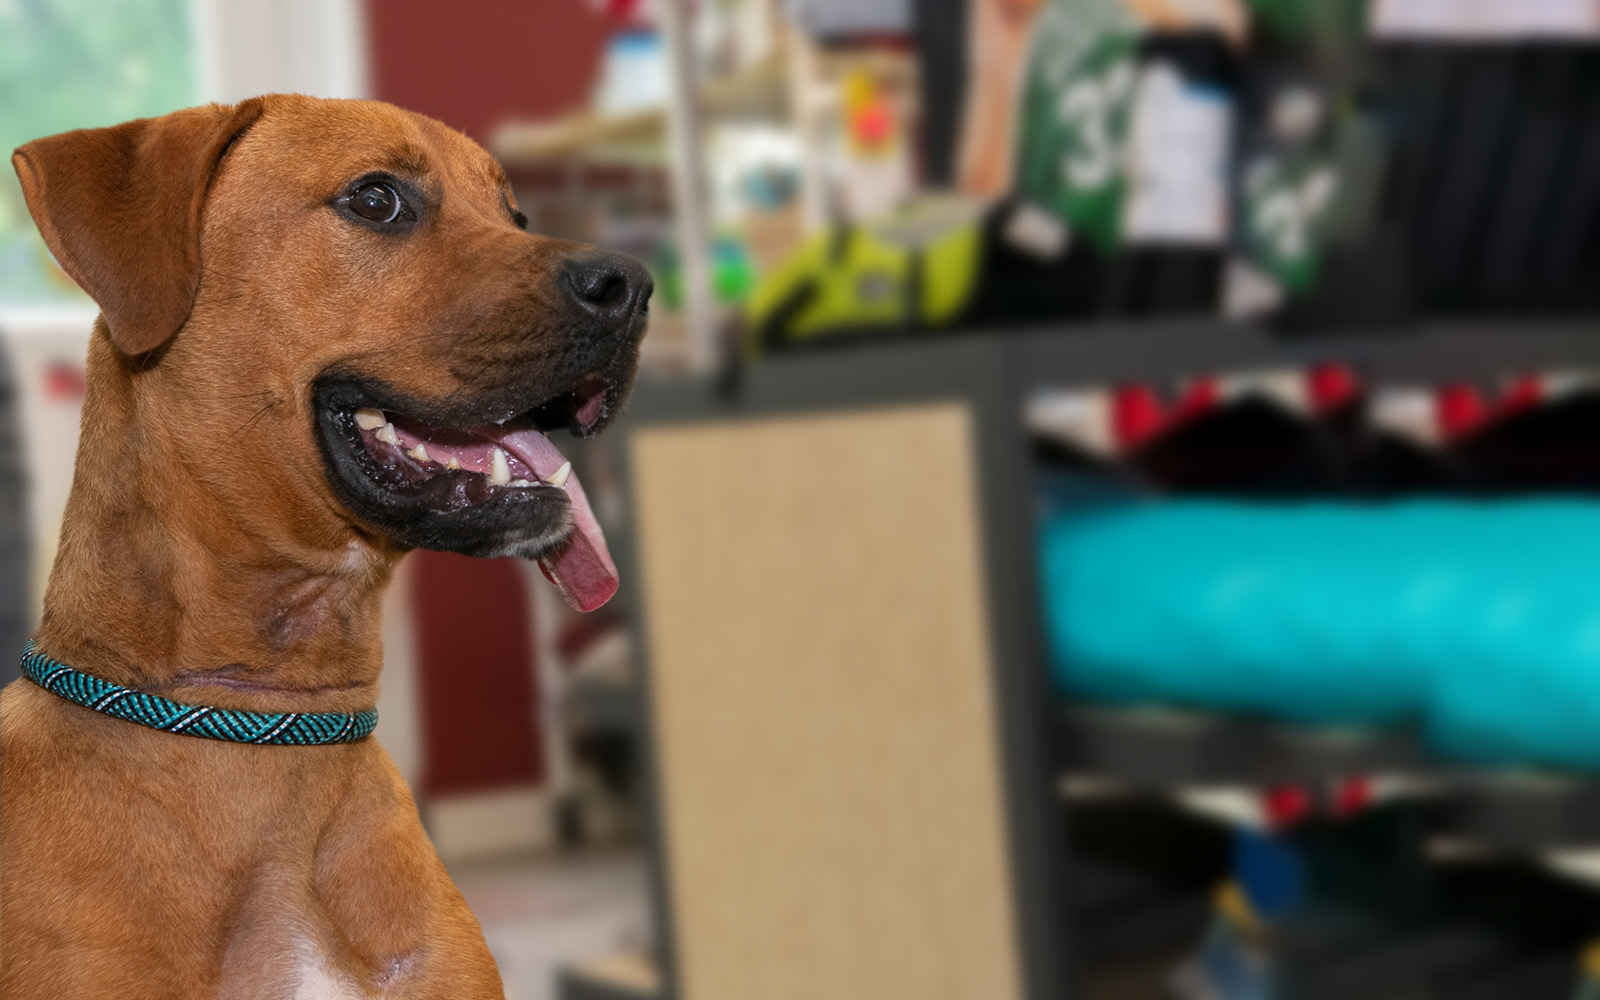 Donate Now to Improve Animal Welfare in Vigo County image